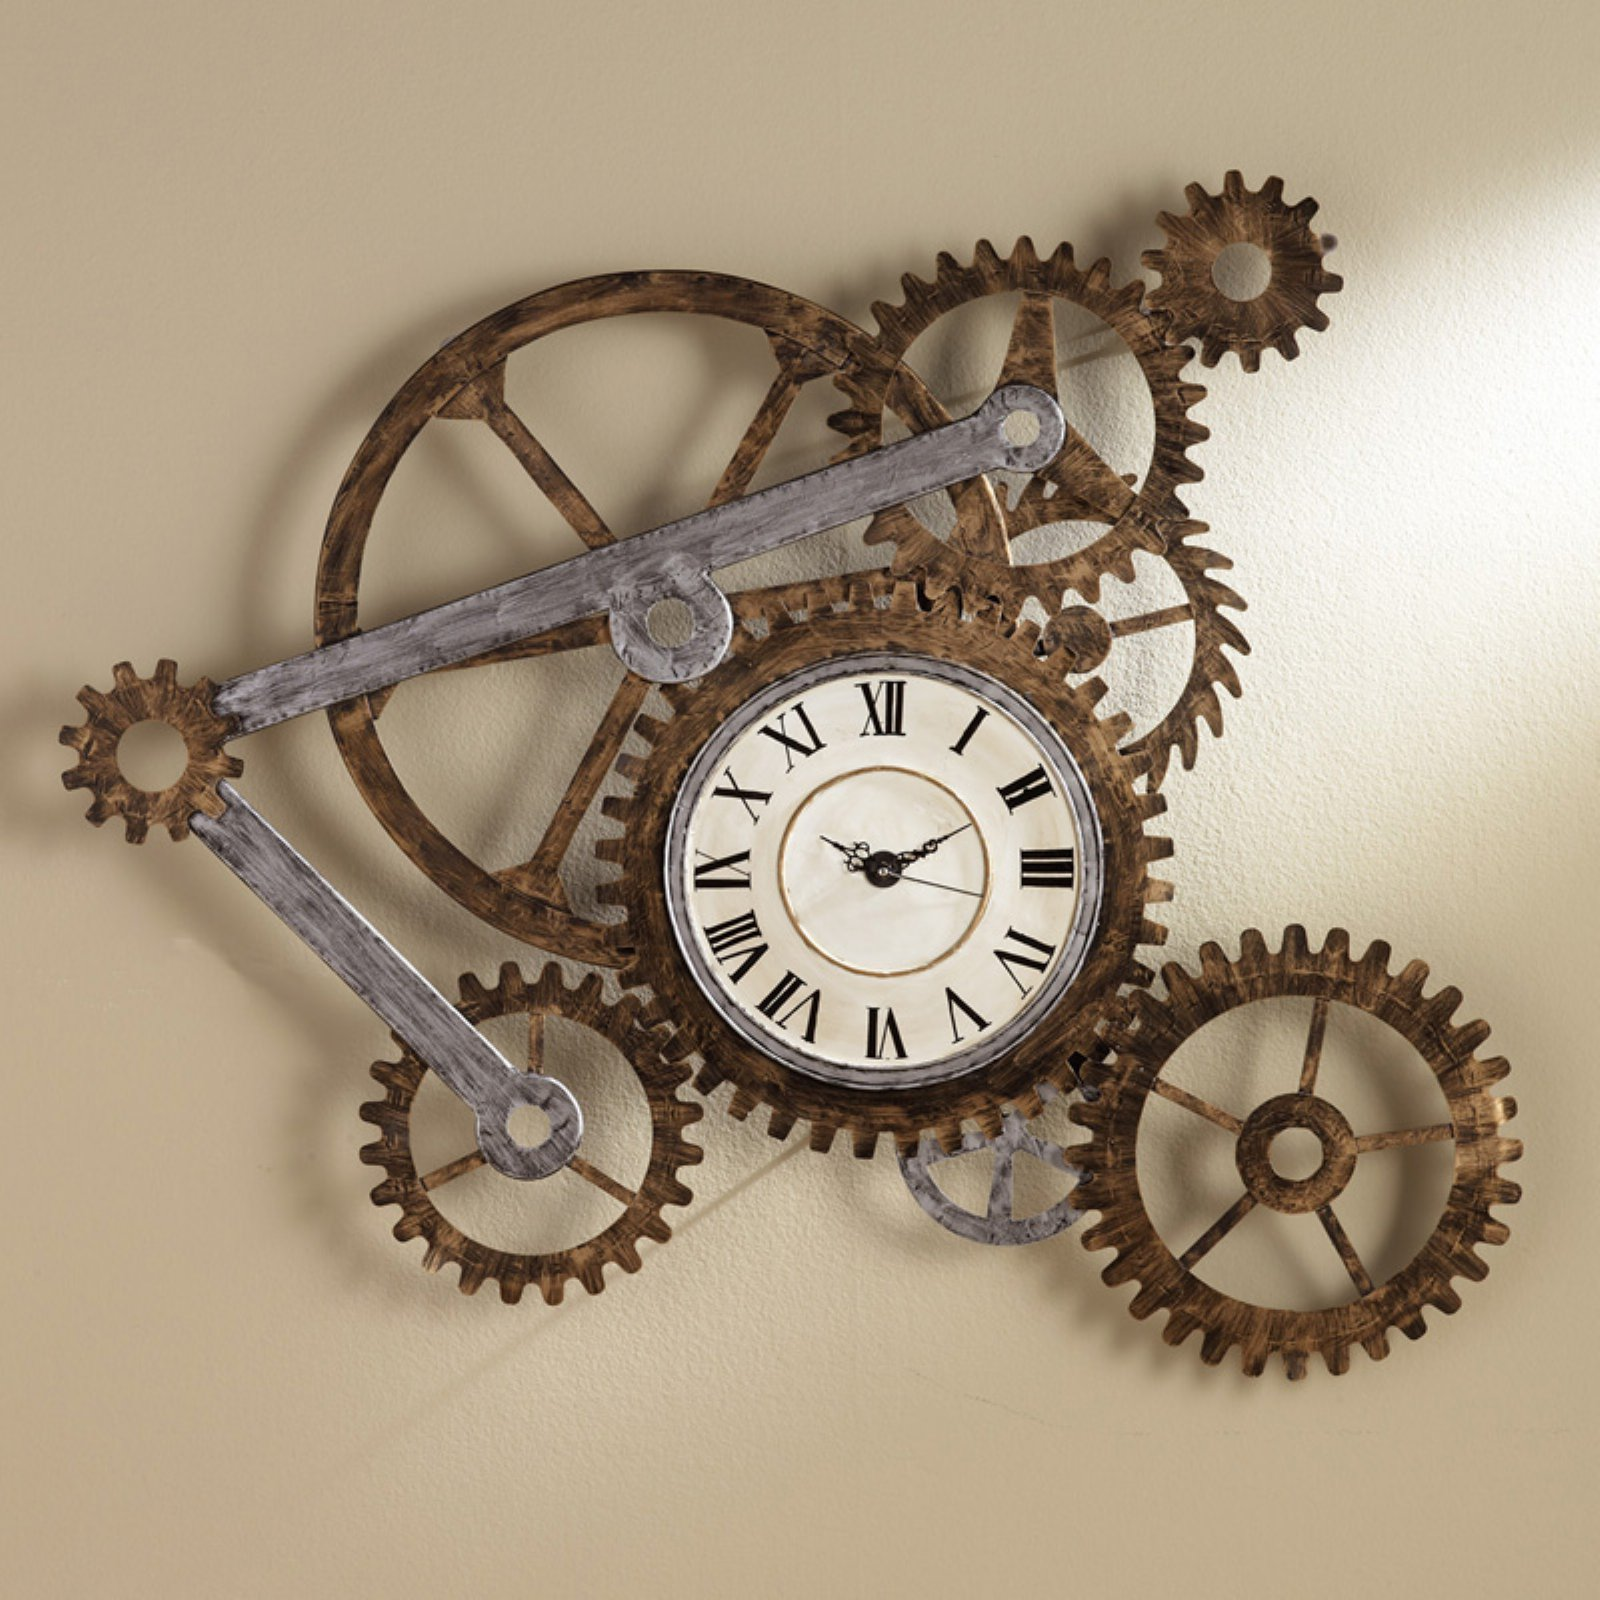 Southern Enterprises Elko Gear Wall Artwork with Clock by Southern Enterprises